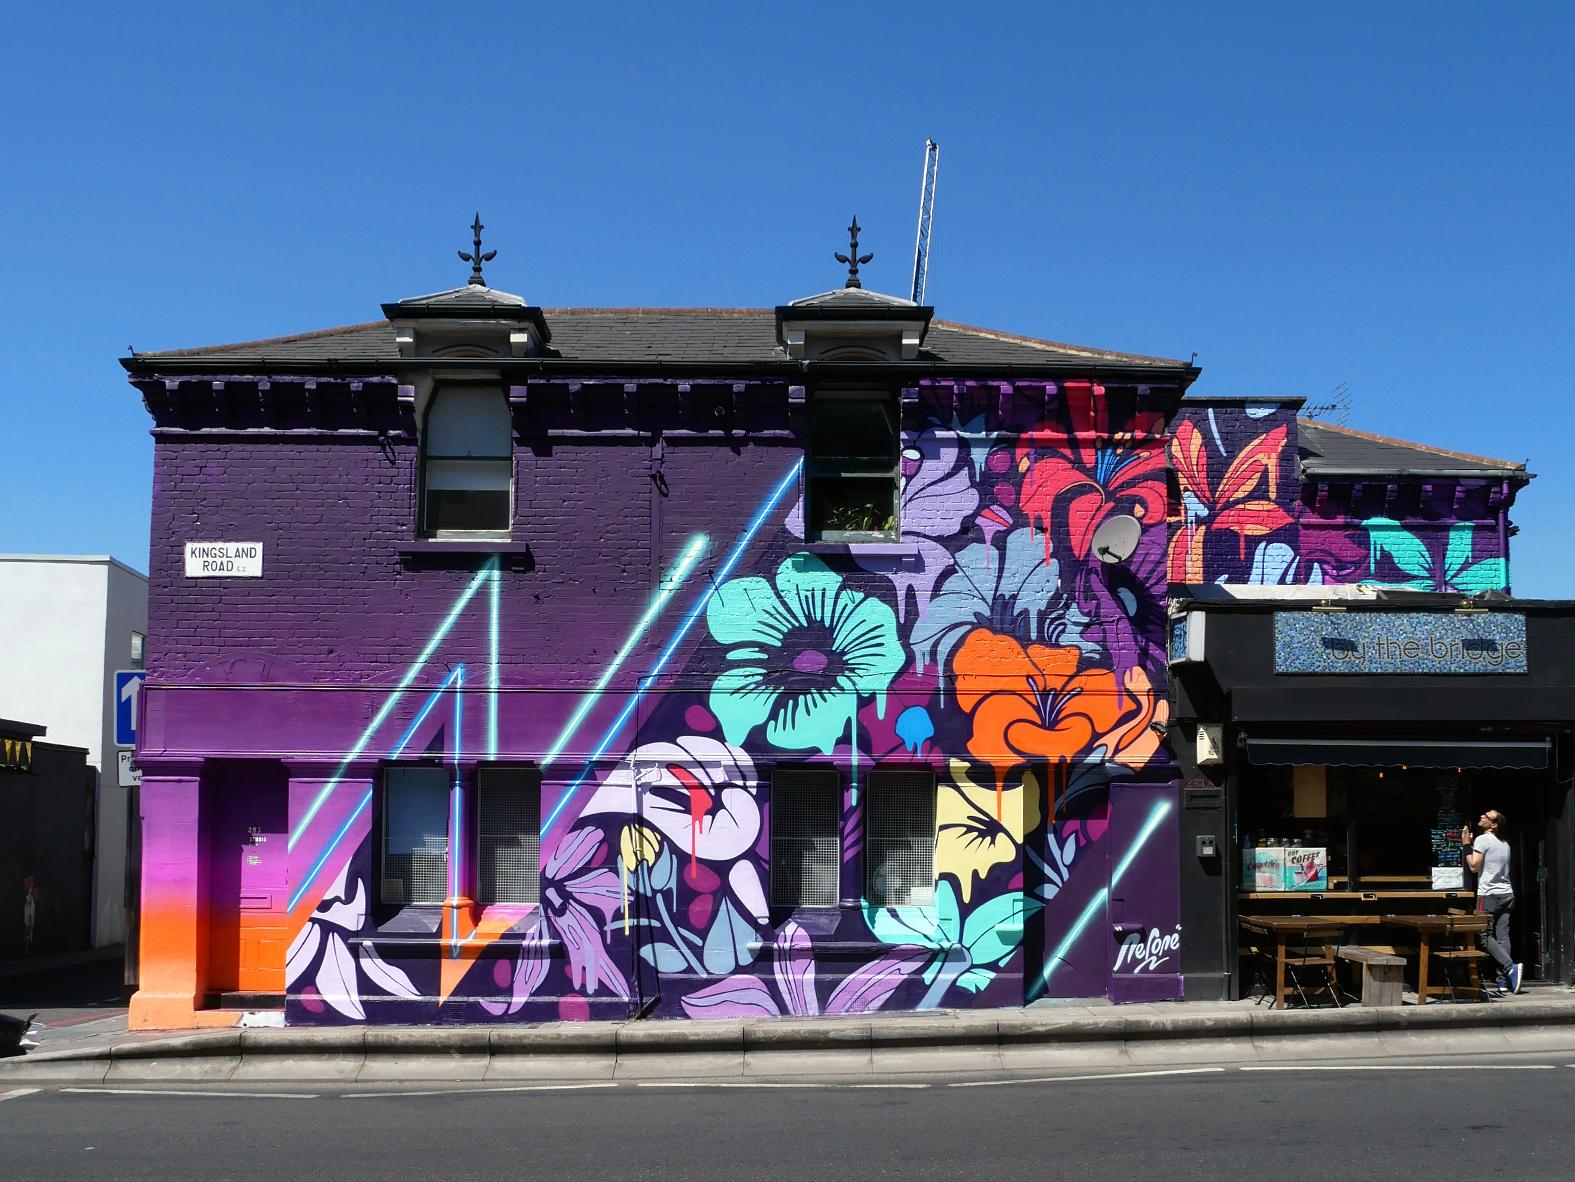 Nerone-olly-gallery-street-art-4